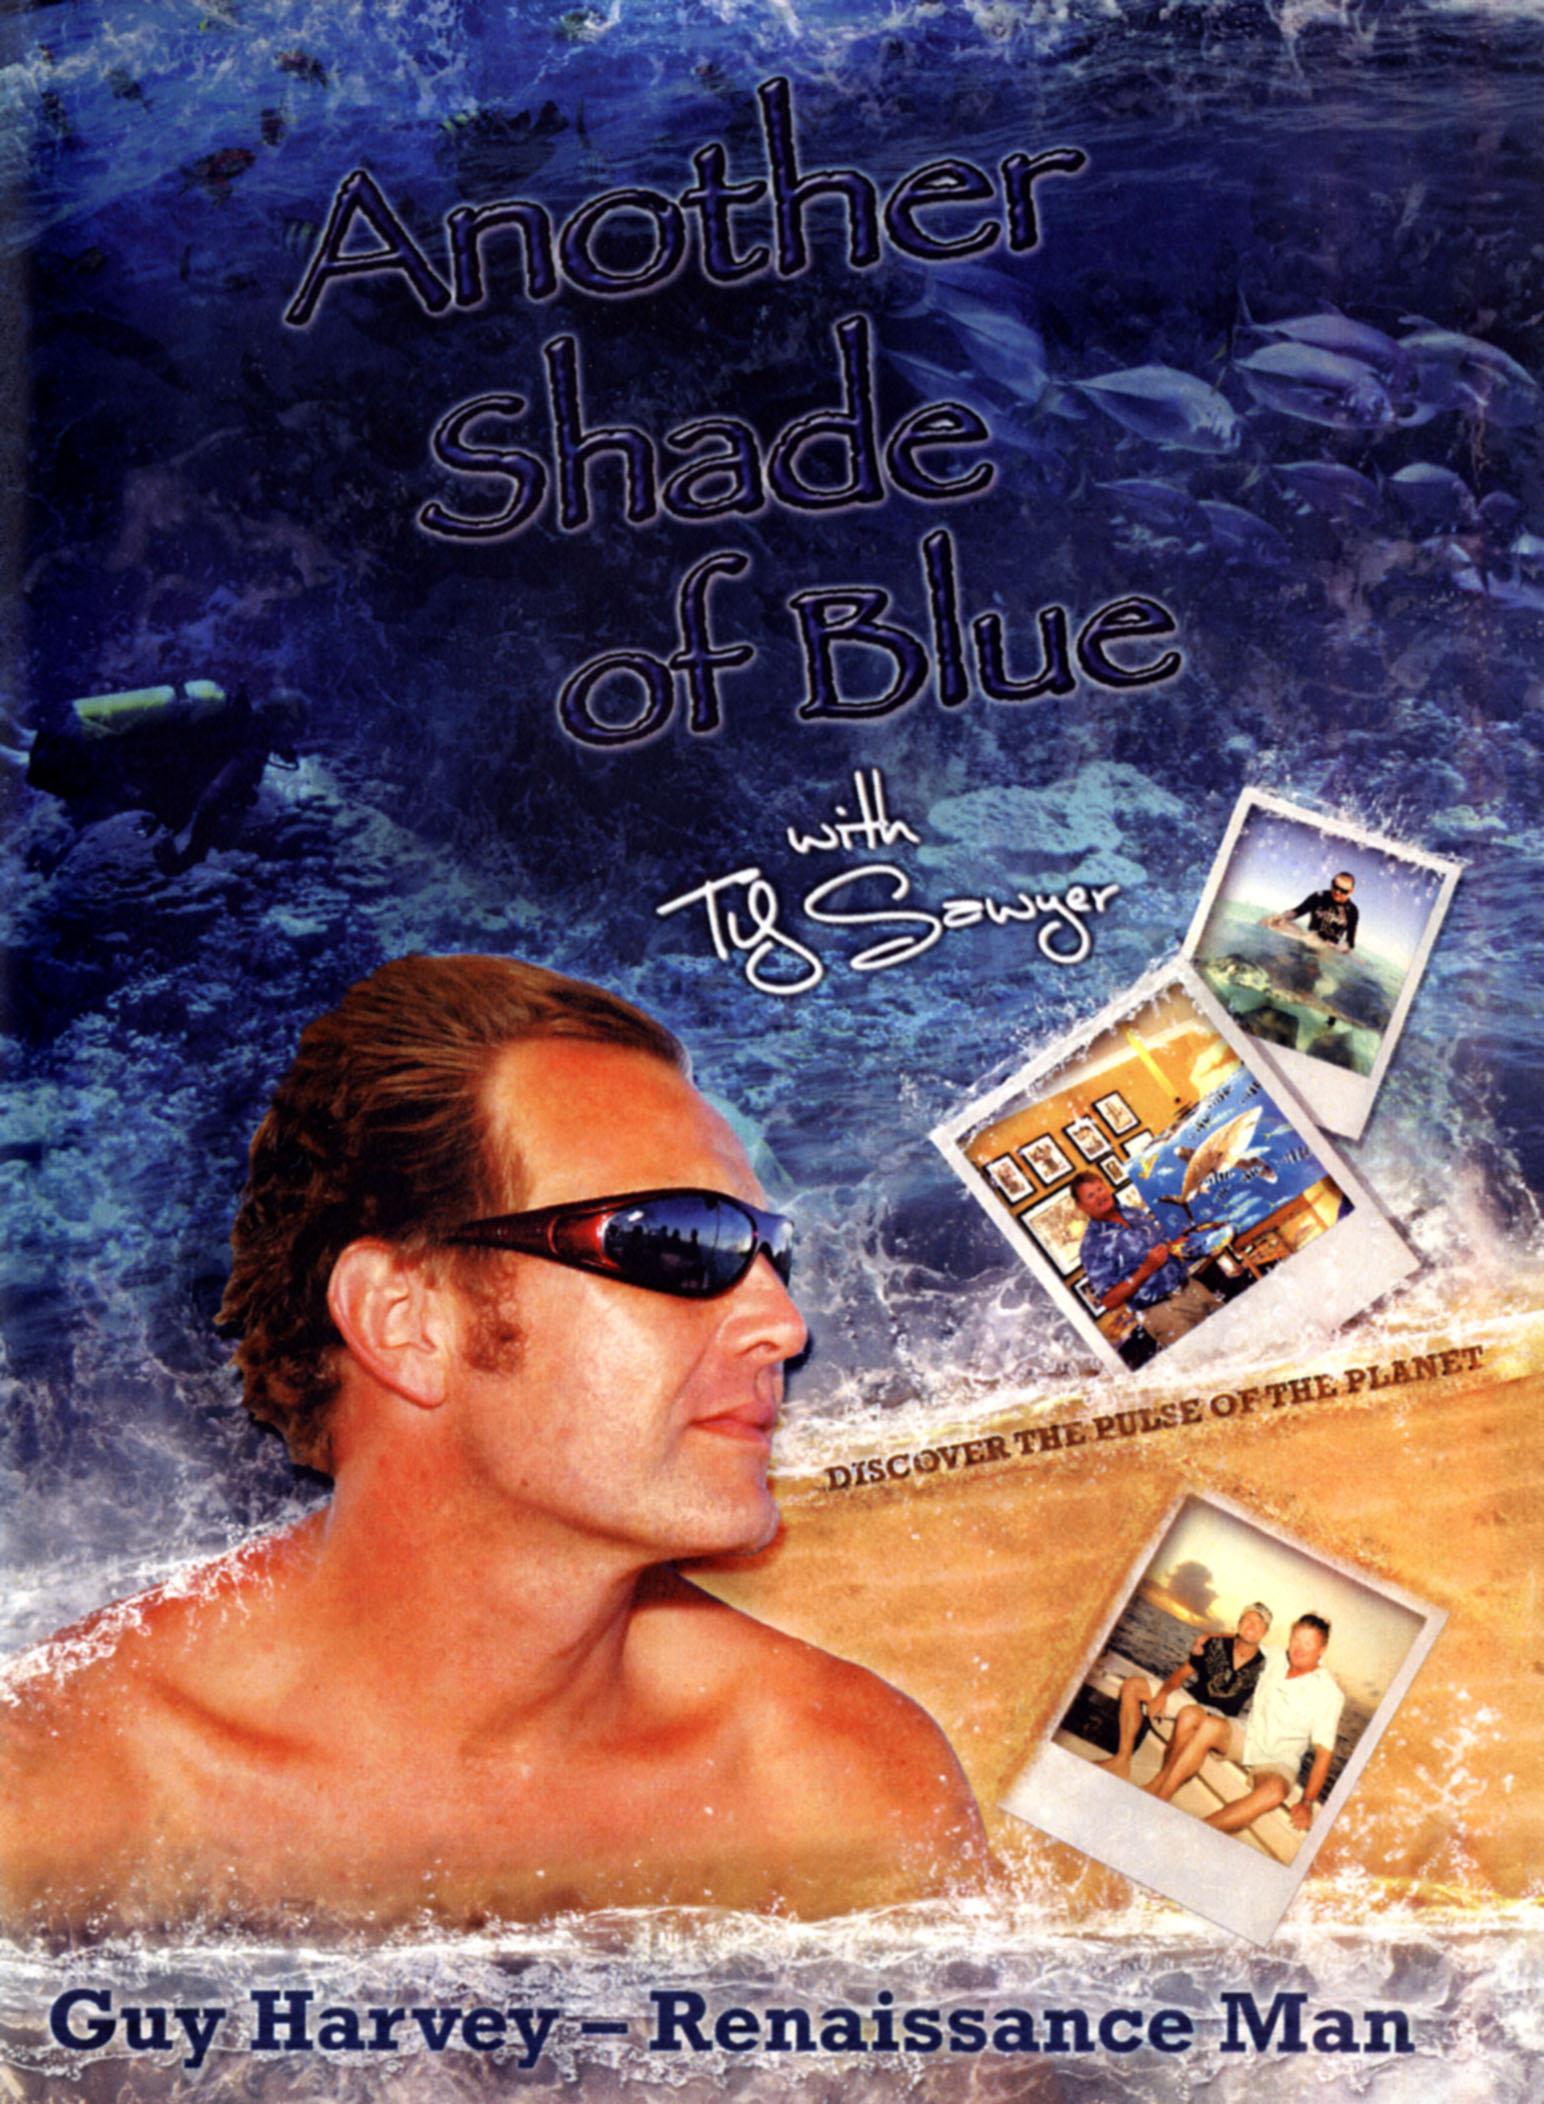 Another Shade of Blue: Guy Harvey - Renaissance Man